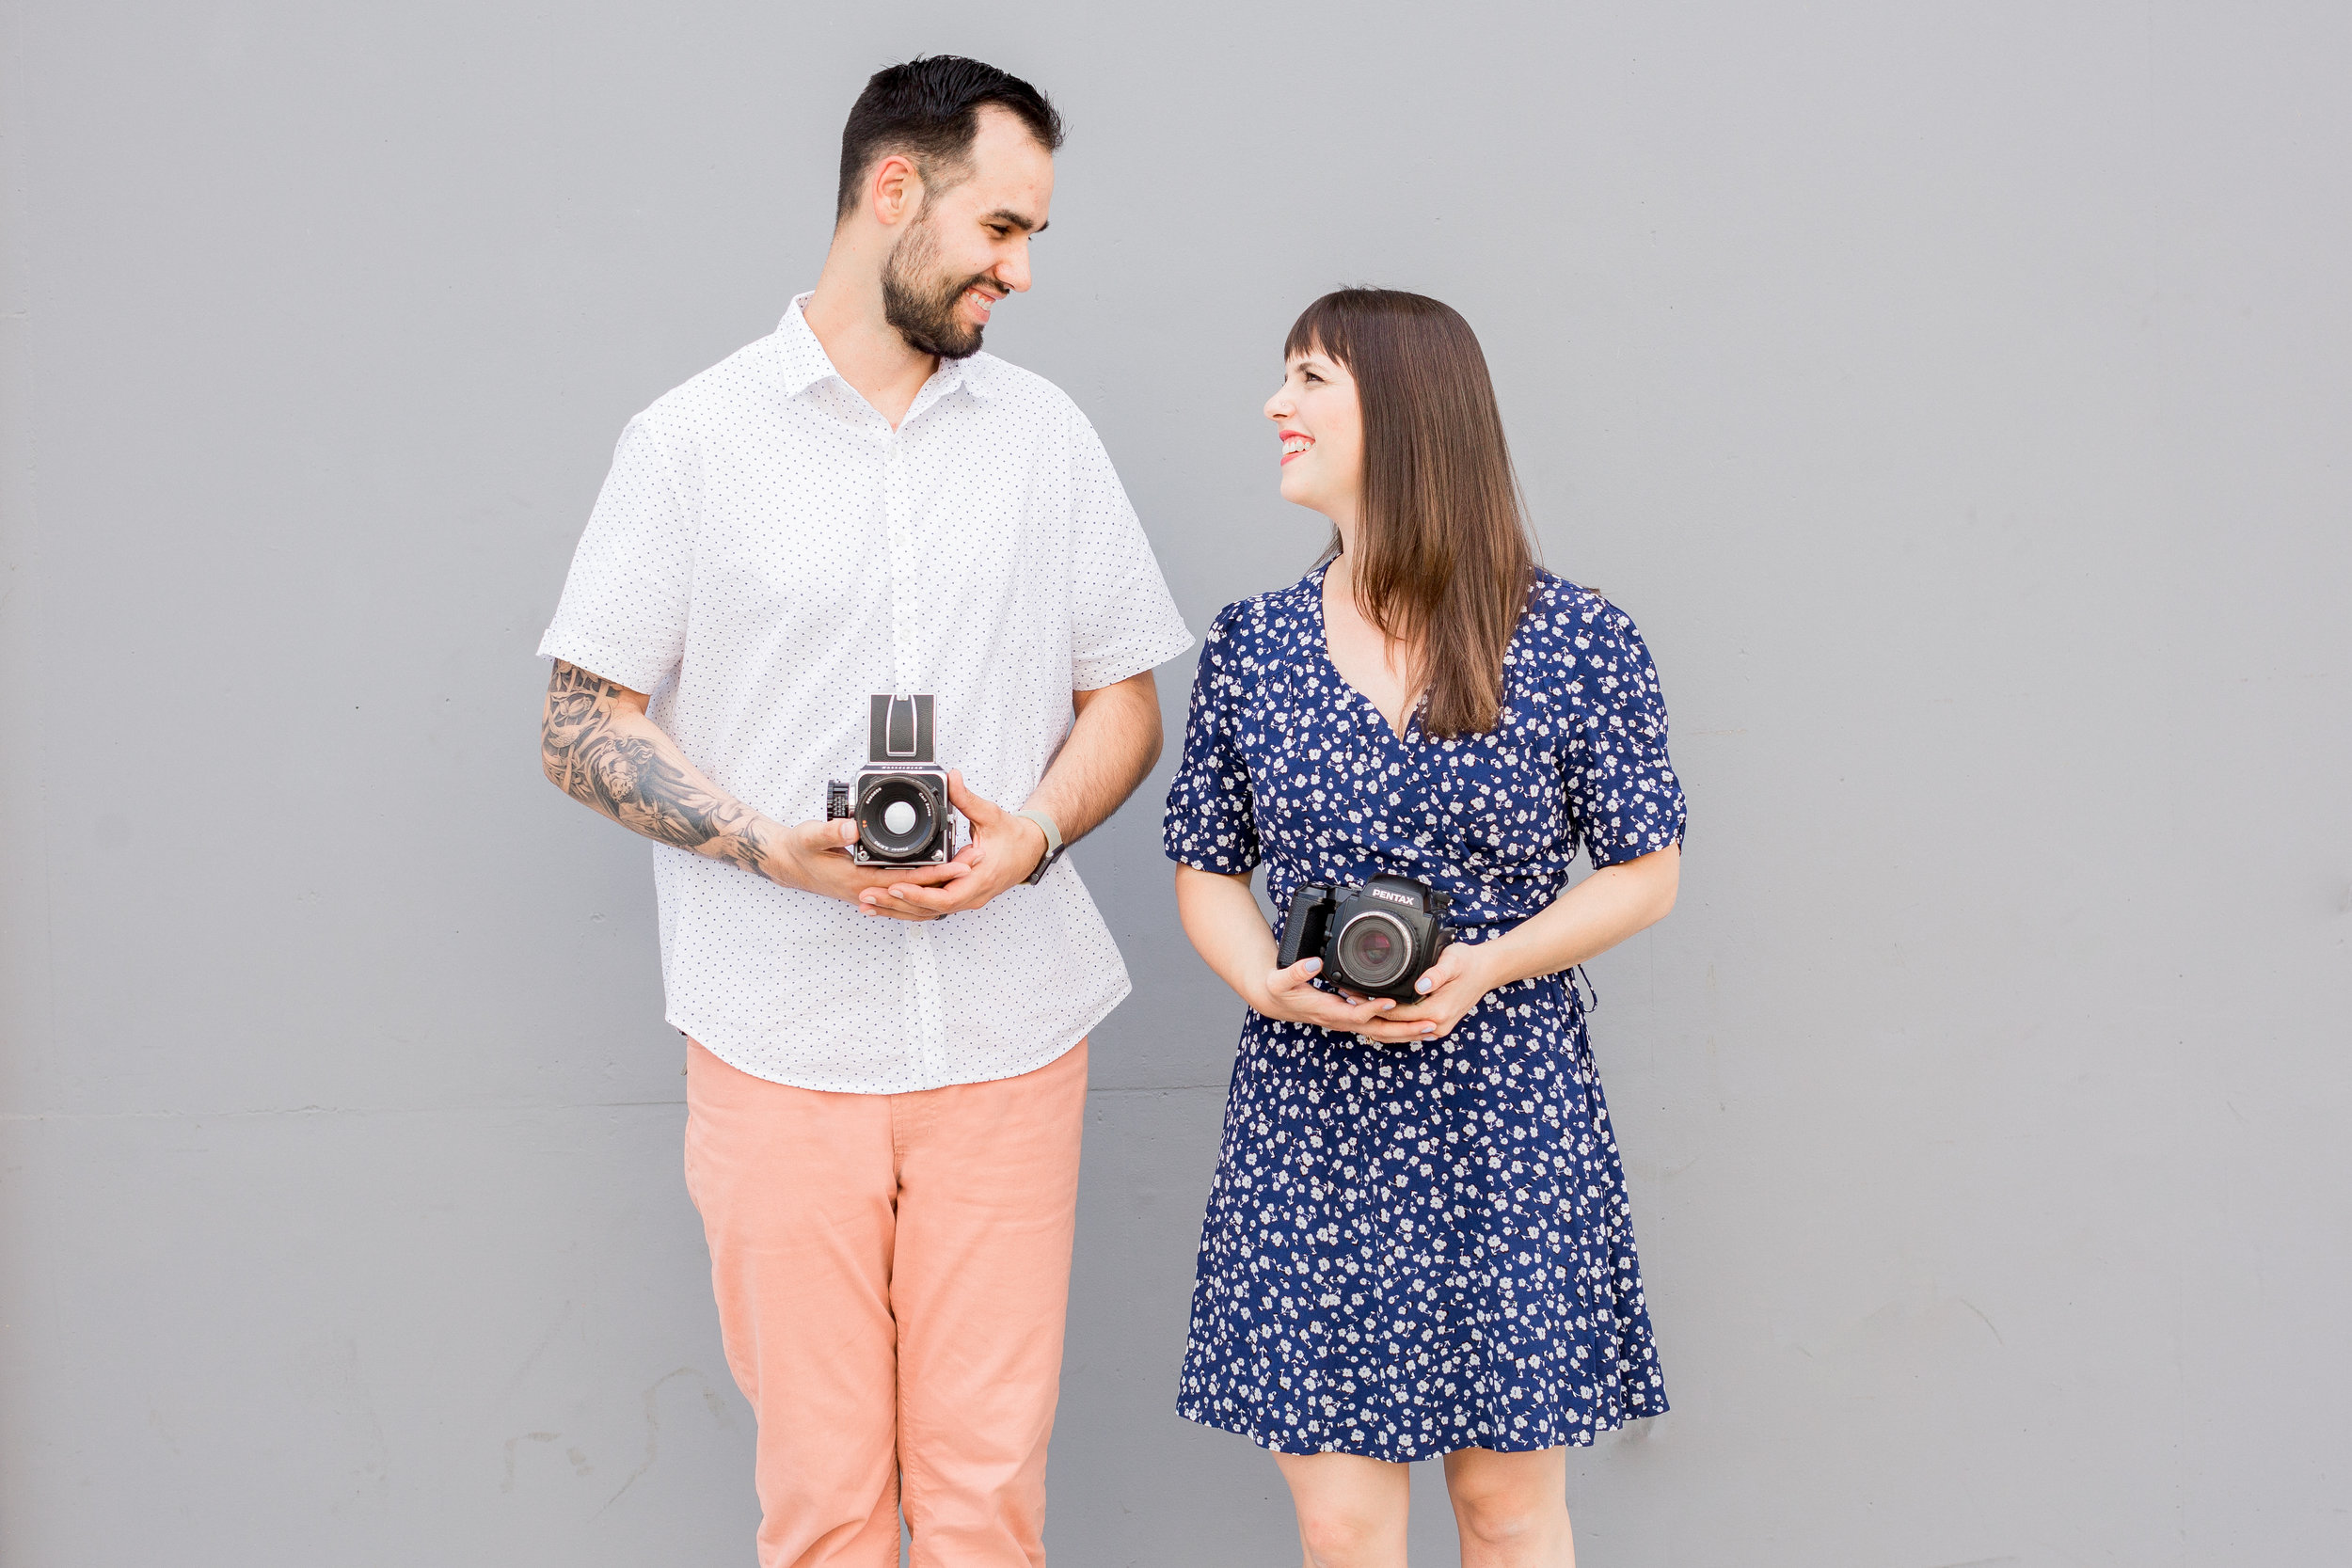 luxur-wedding-photographers-chico-californiajpg